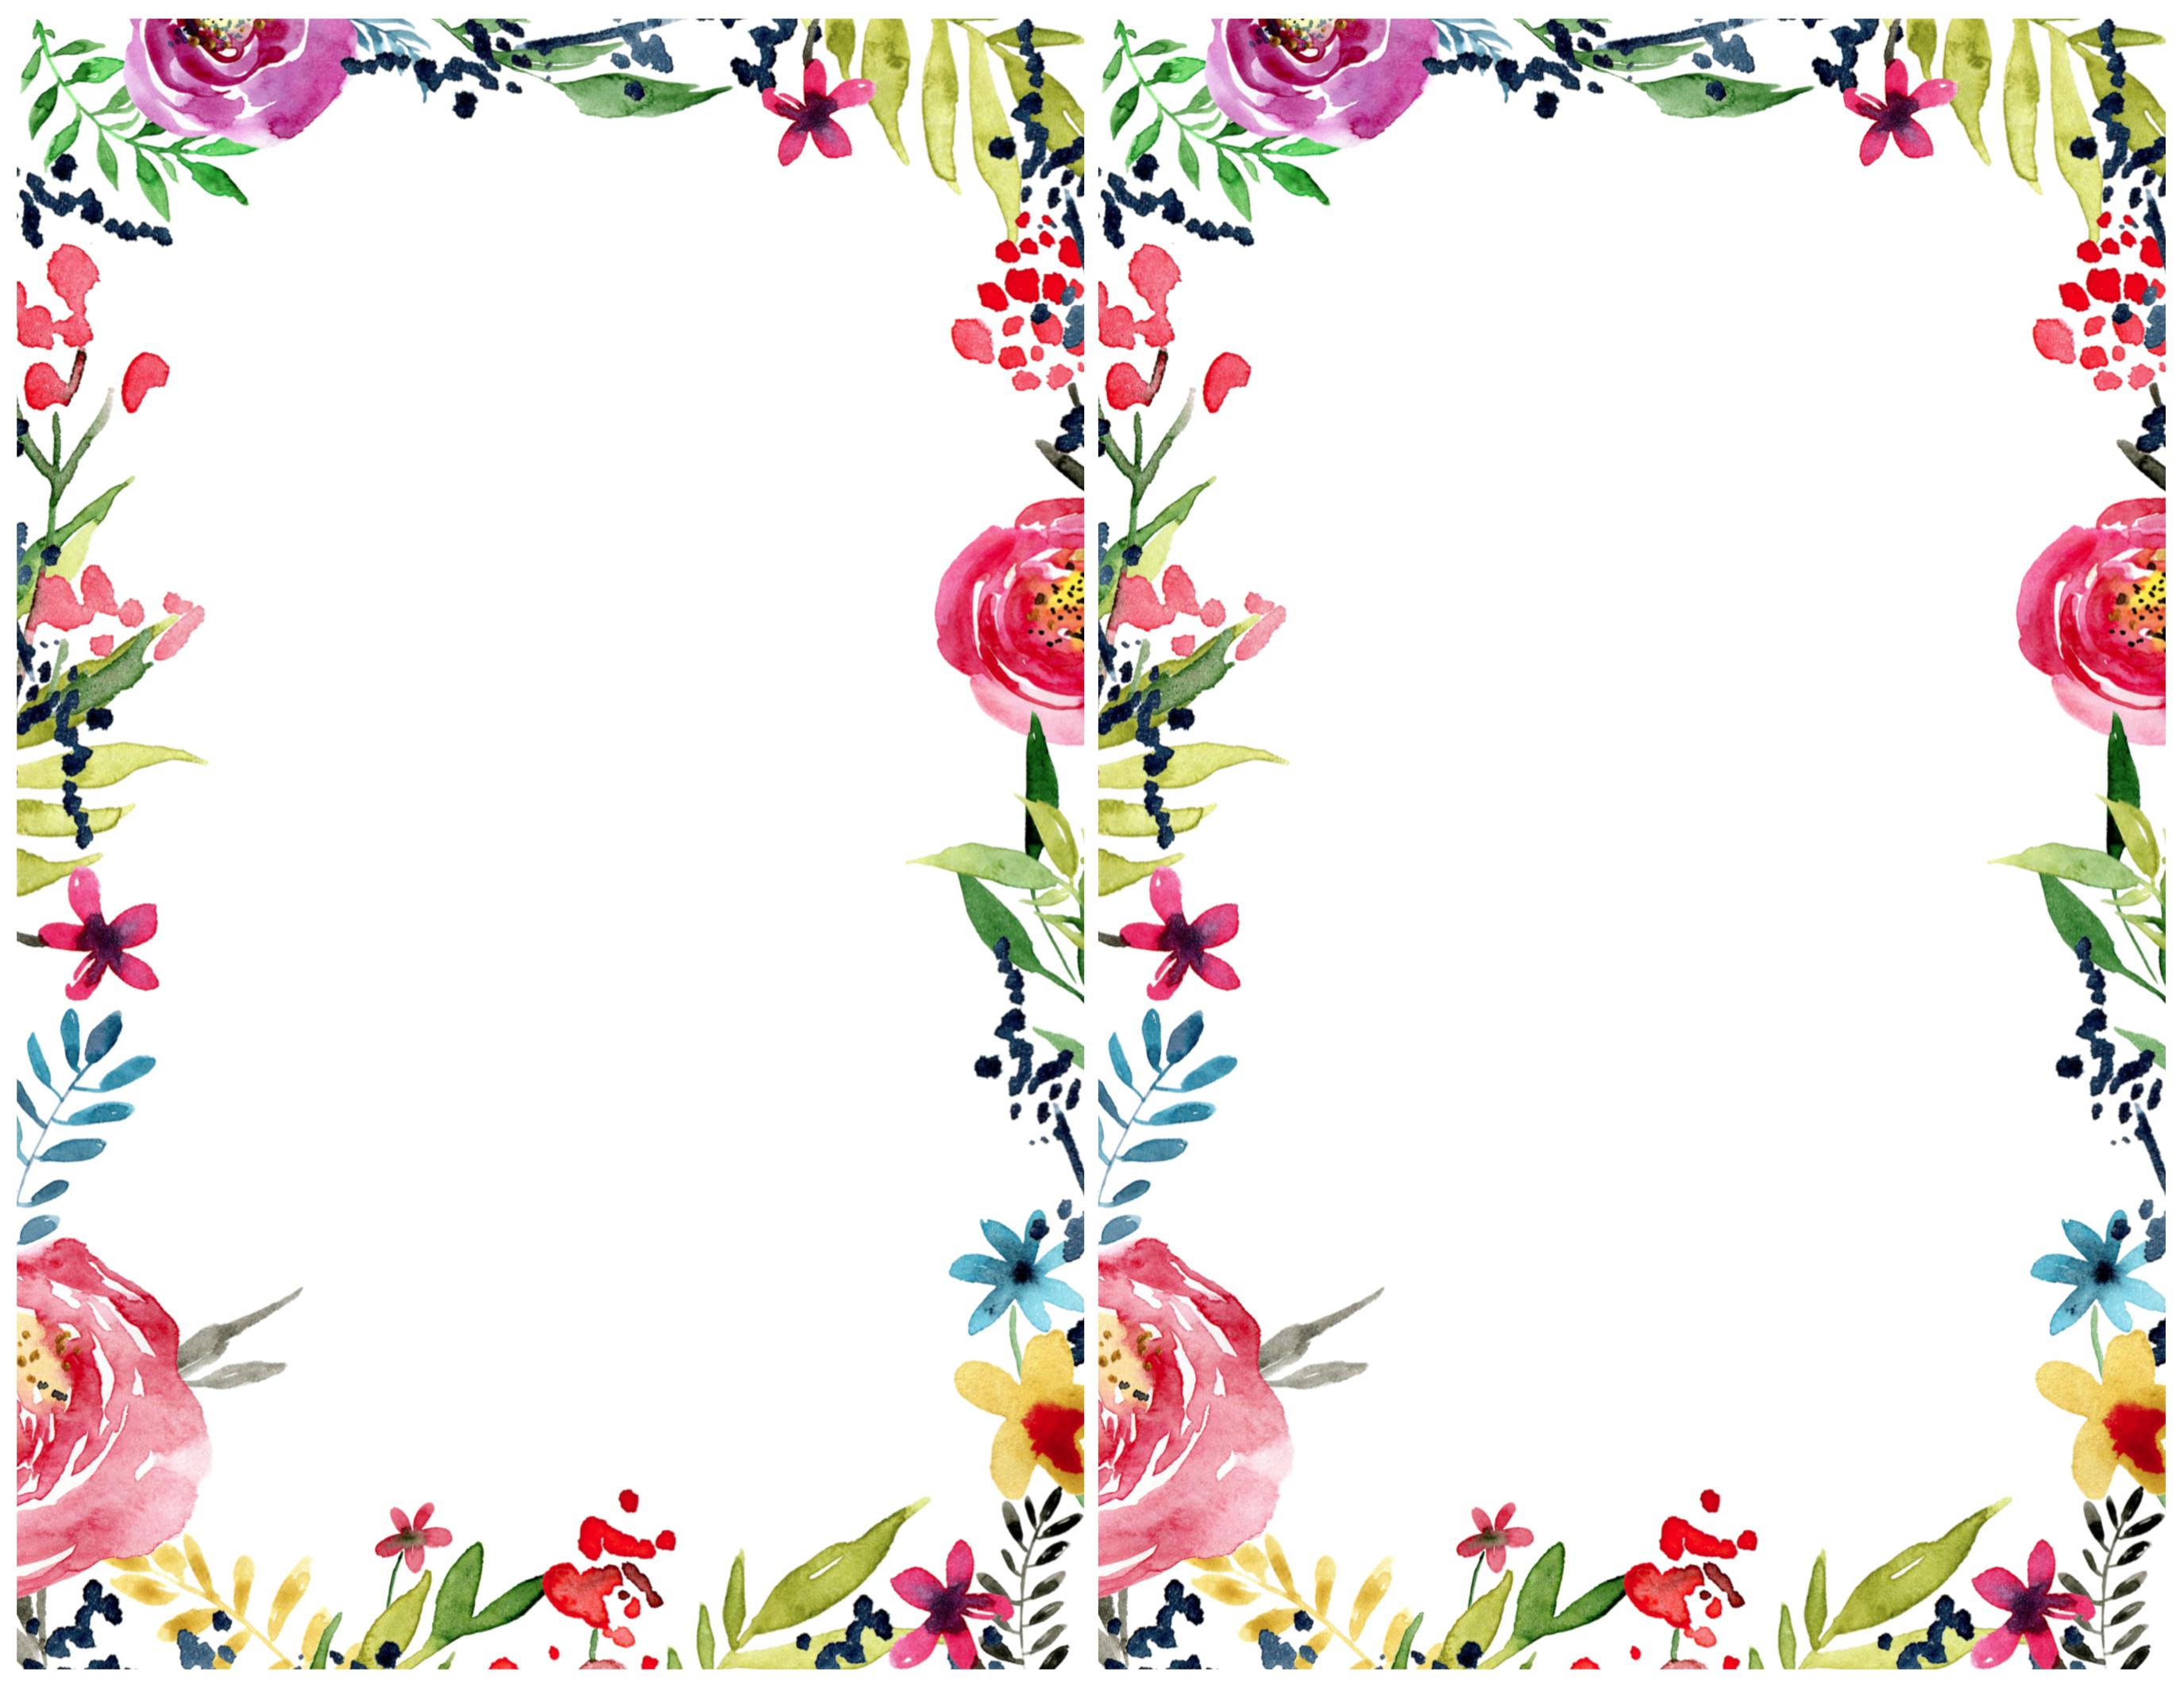 2750x2125 Printable Borders For Pictures C4e38c600b01f73f4ba8ab9c706b98b4